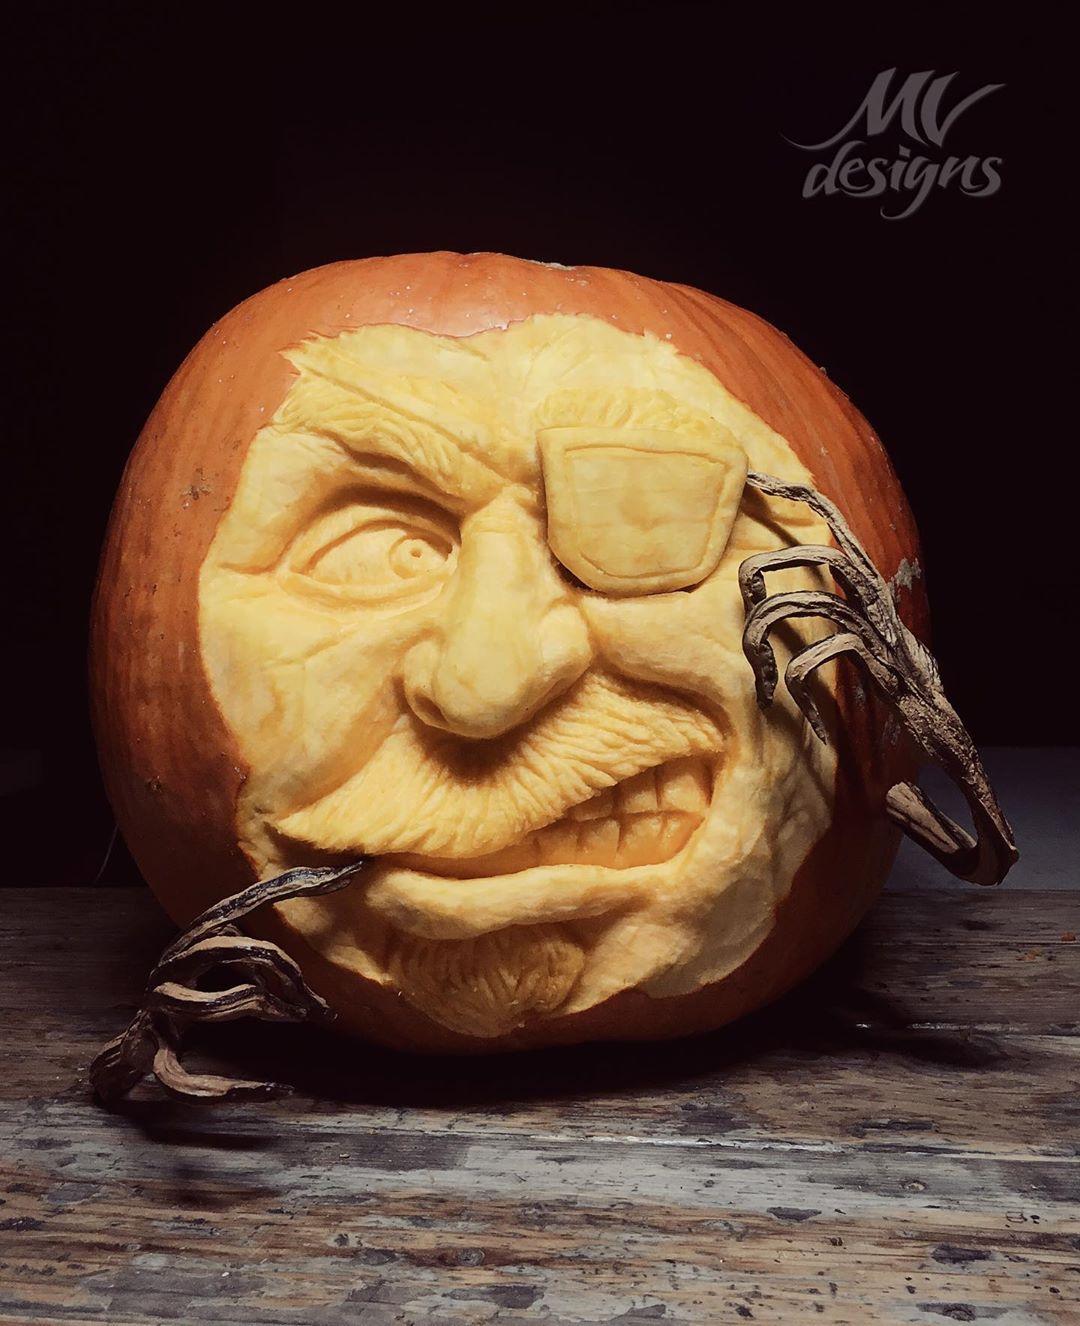 Pirate Carved Pumpkin | 25+ Creative Carved Pumpkins